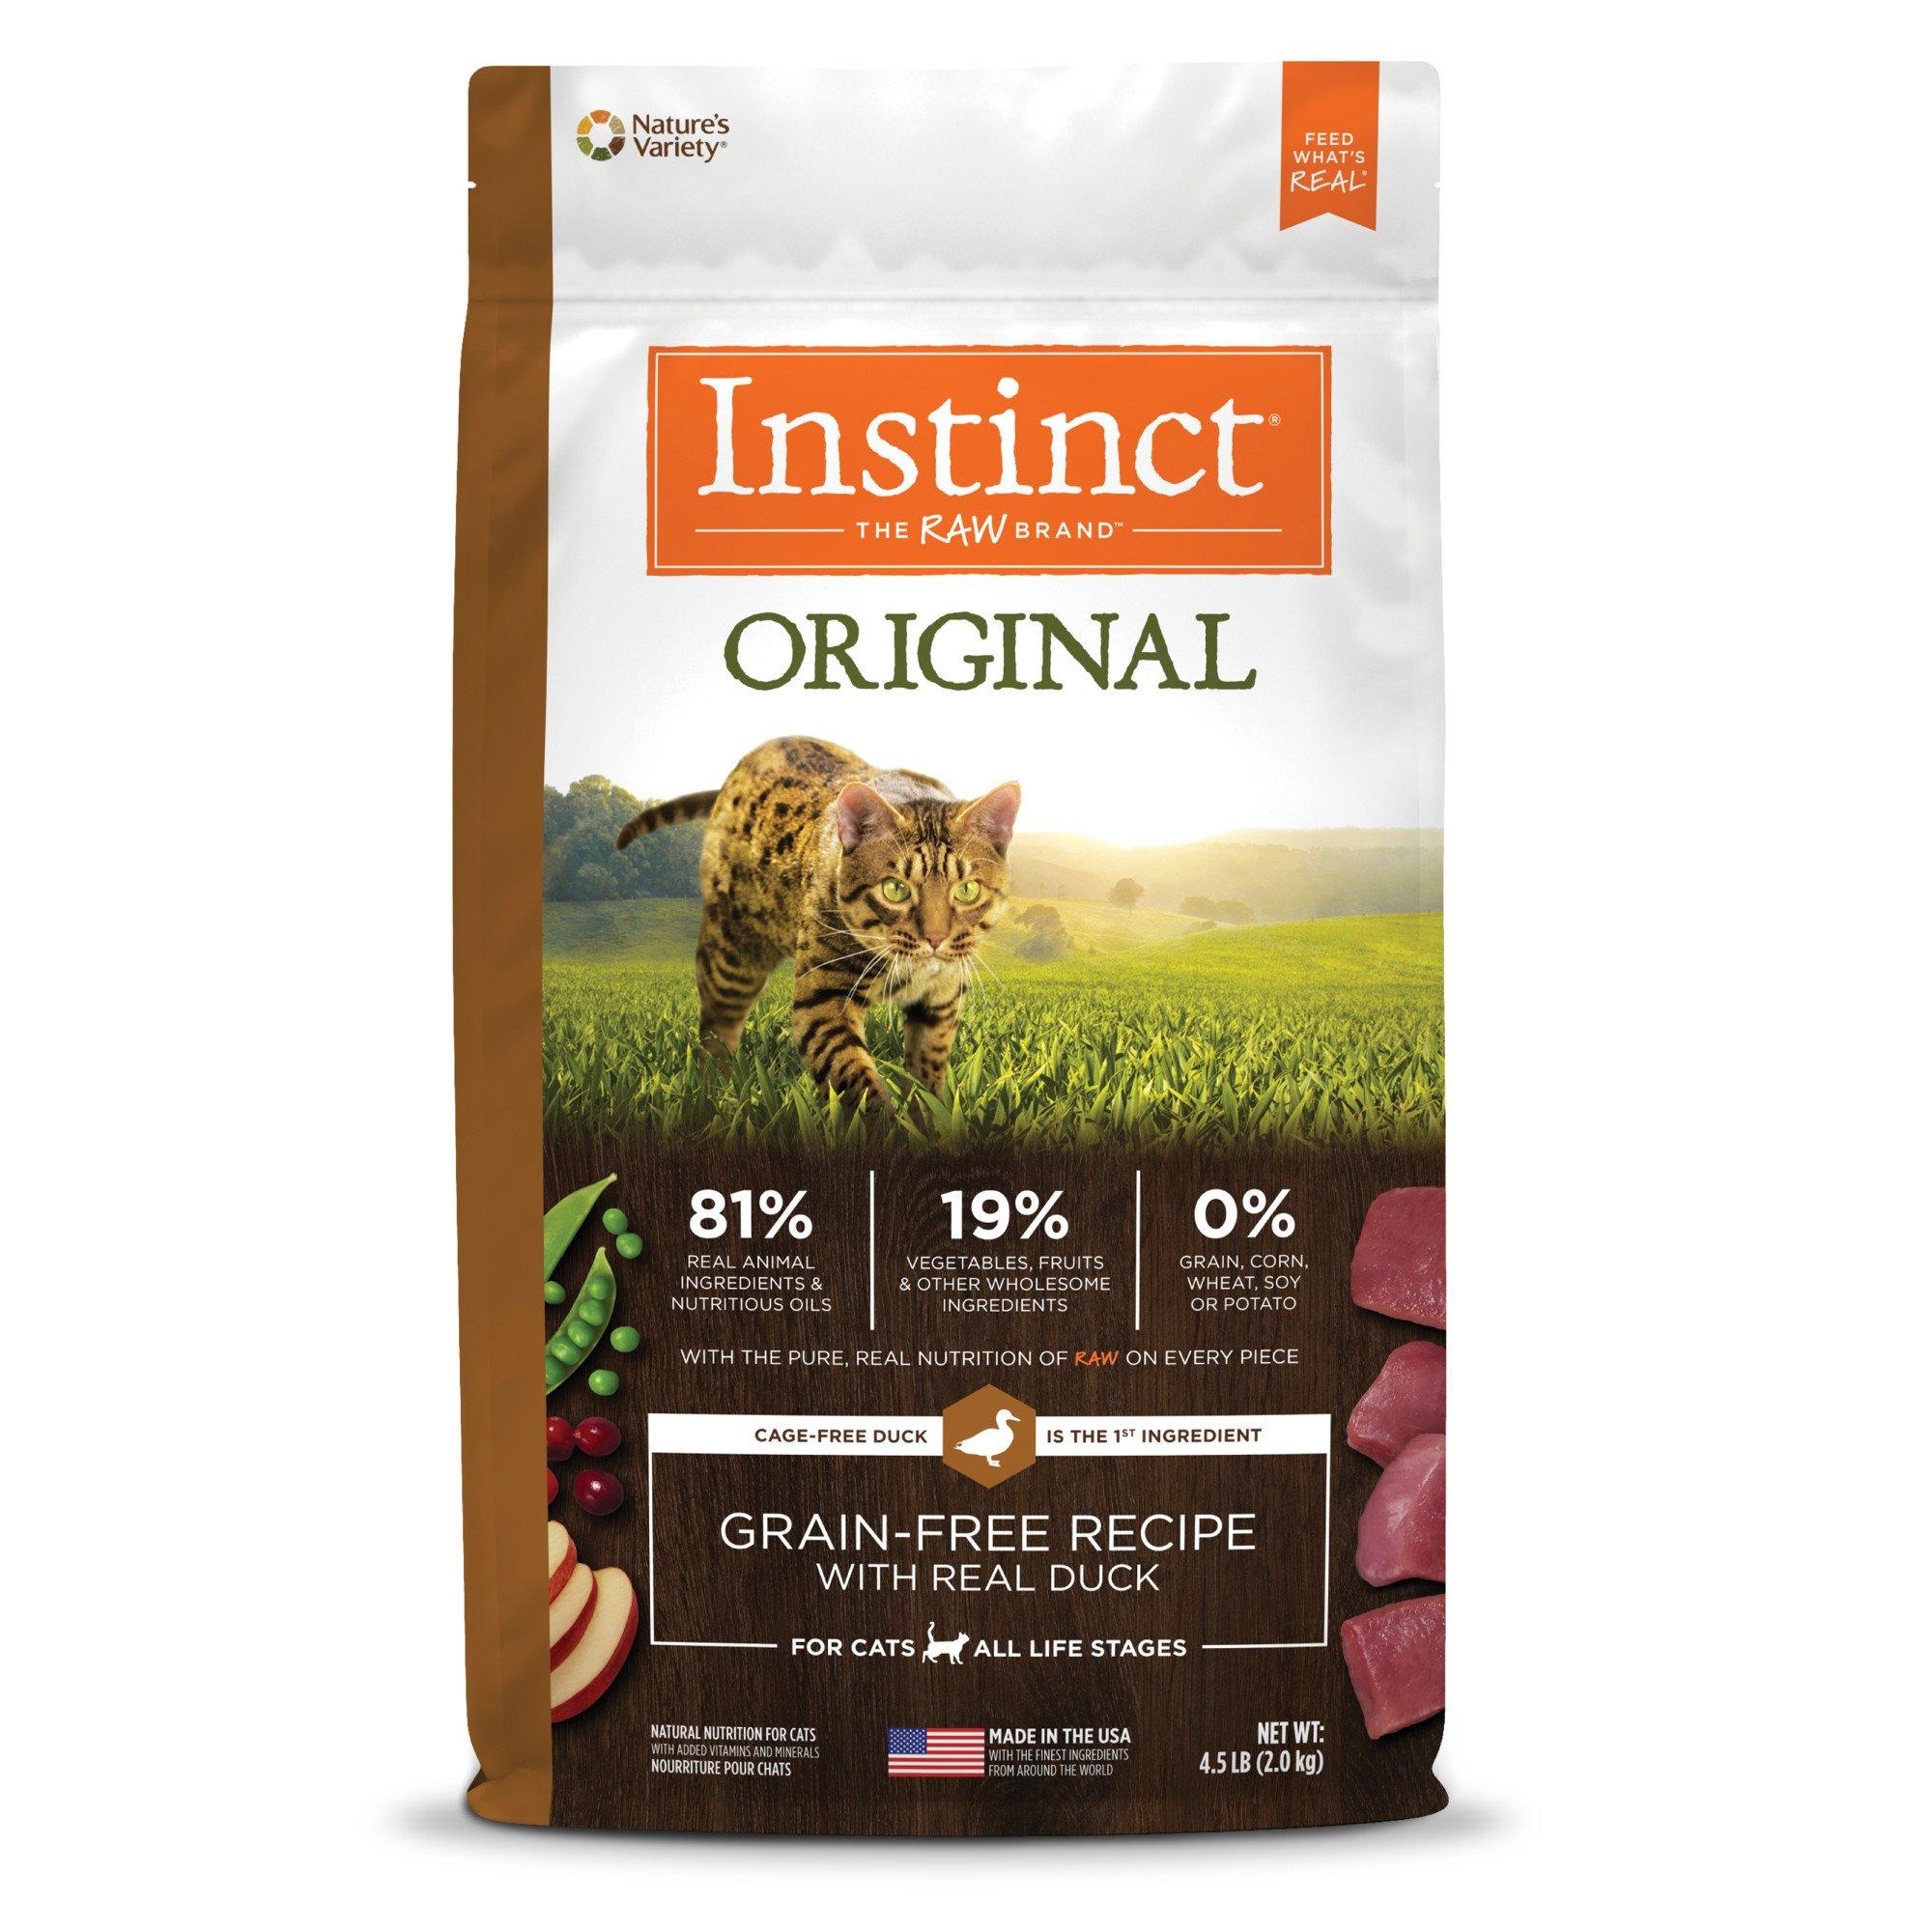 Instinct Grain Free Dry Cat Food By Nature